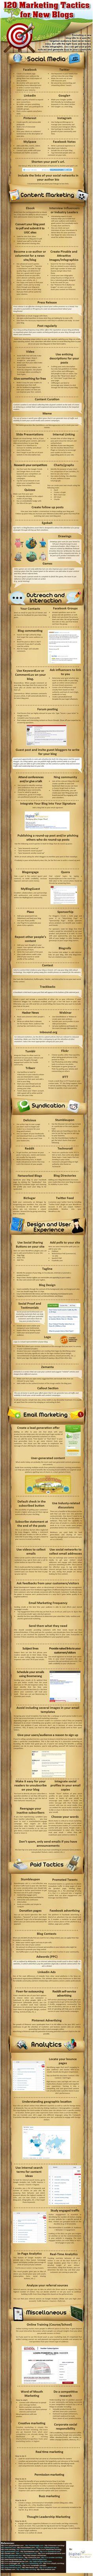 120 Marketing Tactics for #Blogging Success #blog #blogtips #blogging #bloggingtips #SocialMedia #SocialMediaTips #MarketingTips #Marketing #content #marketing #contentmarketing #contentmarketingtips